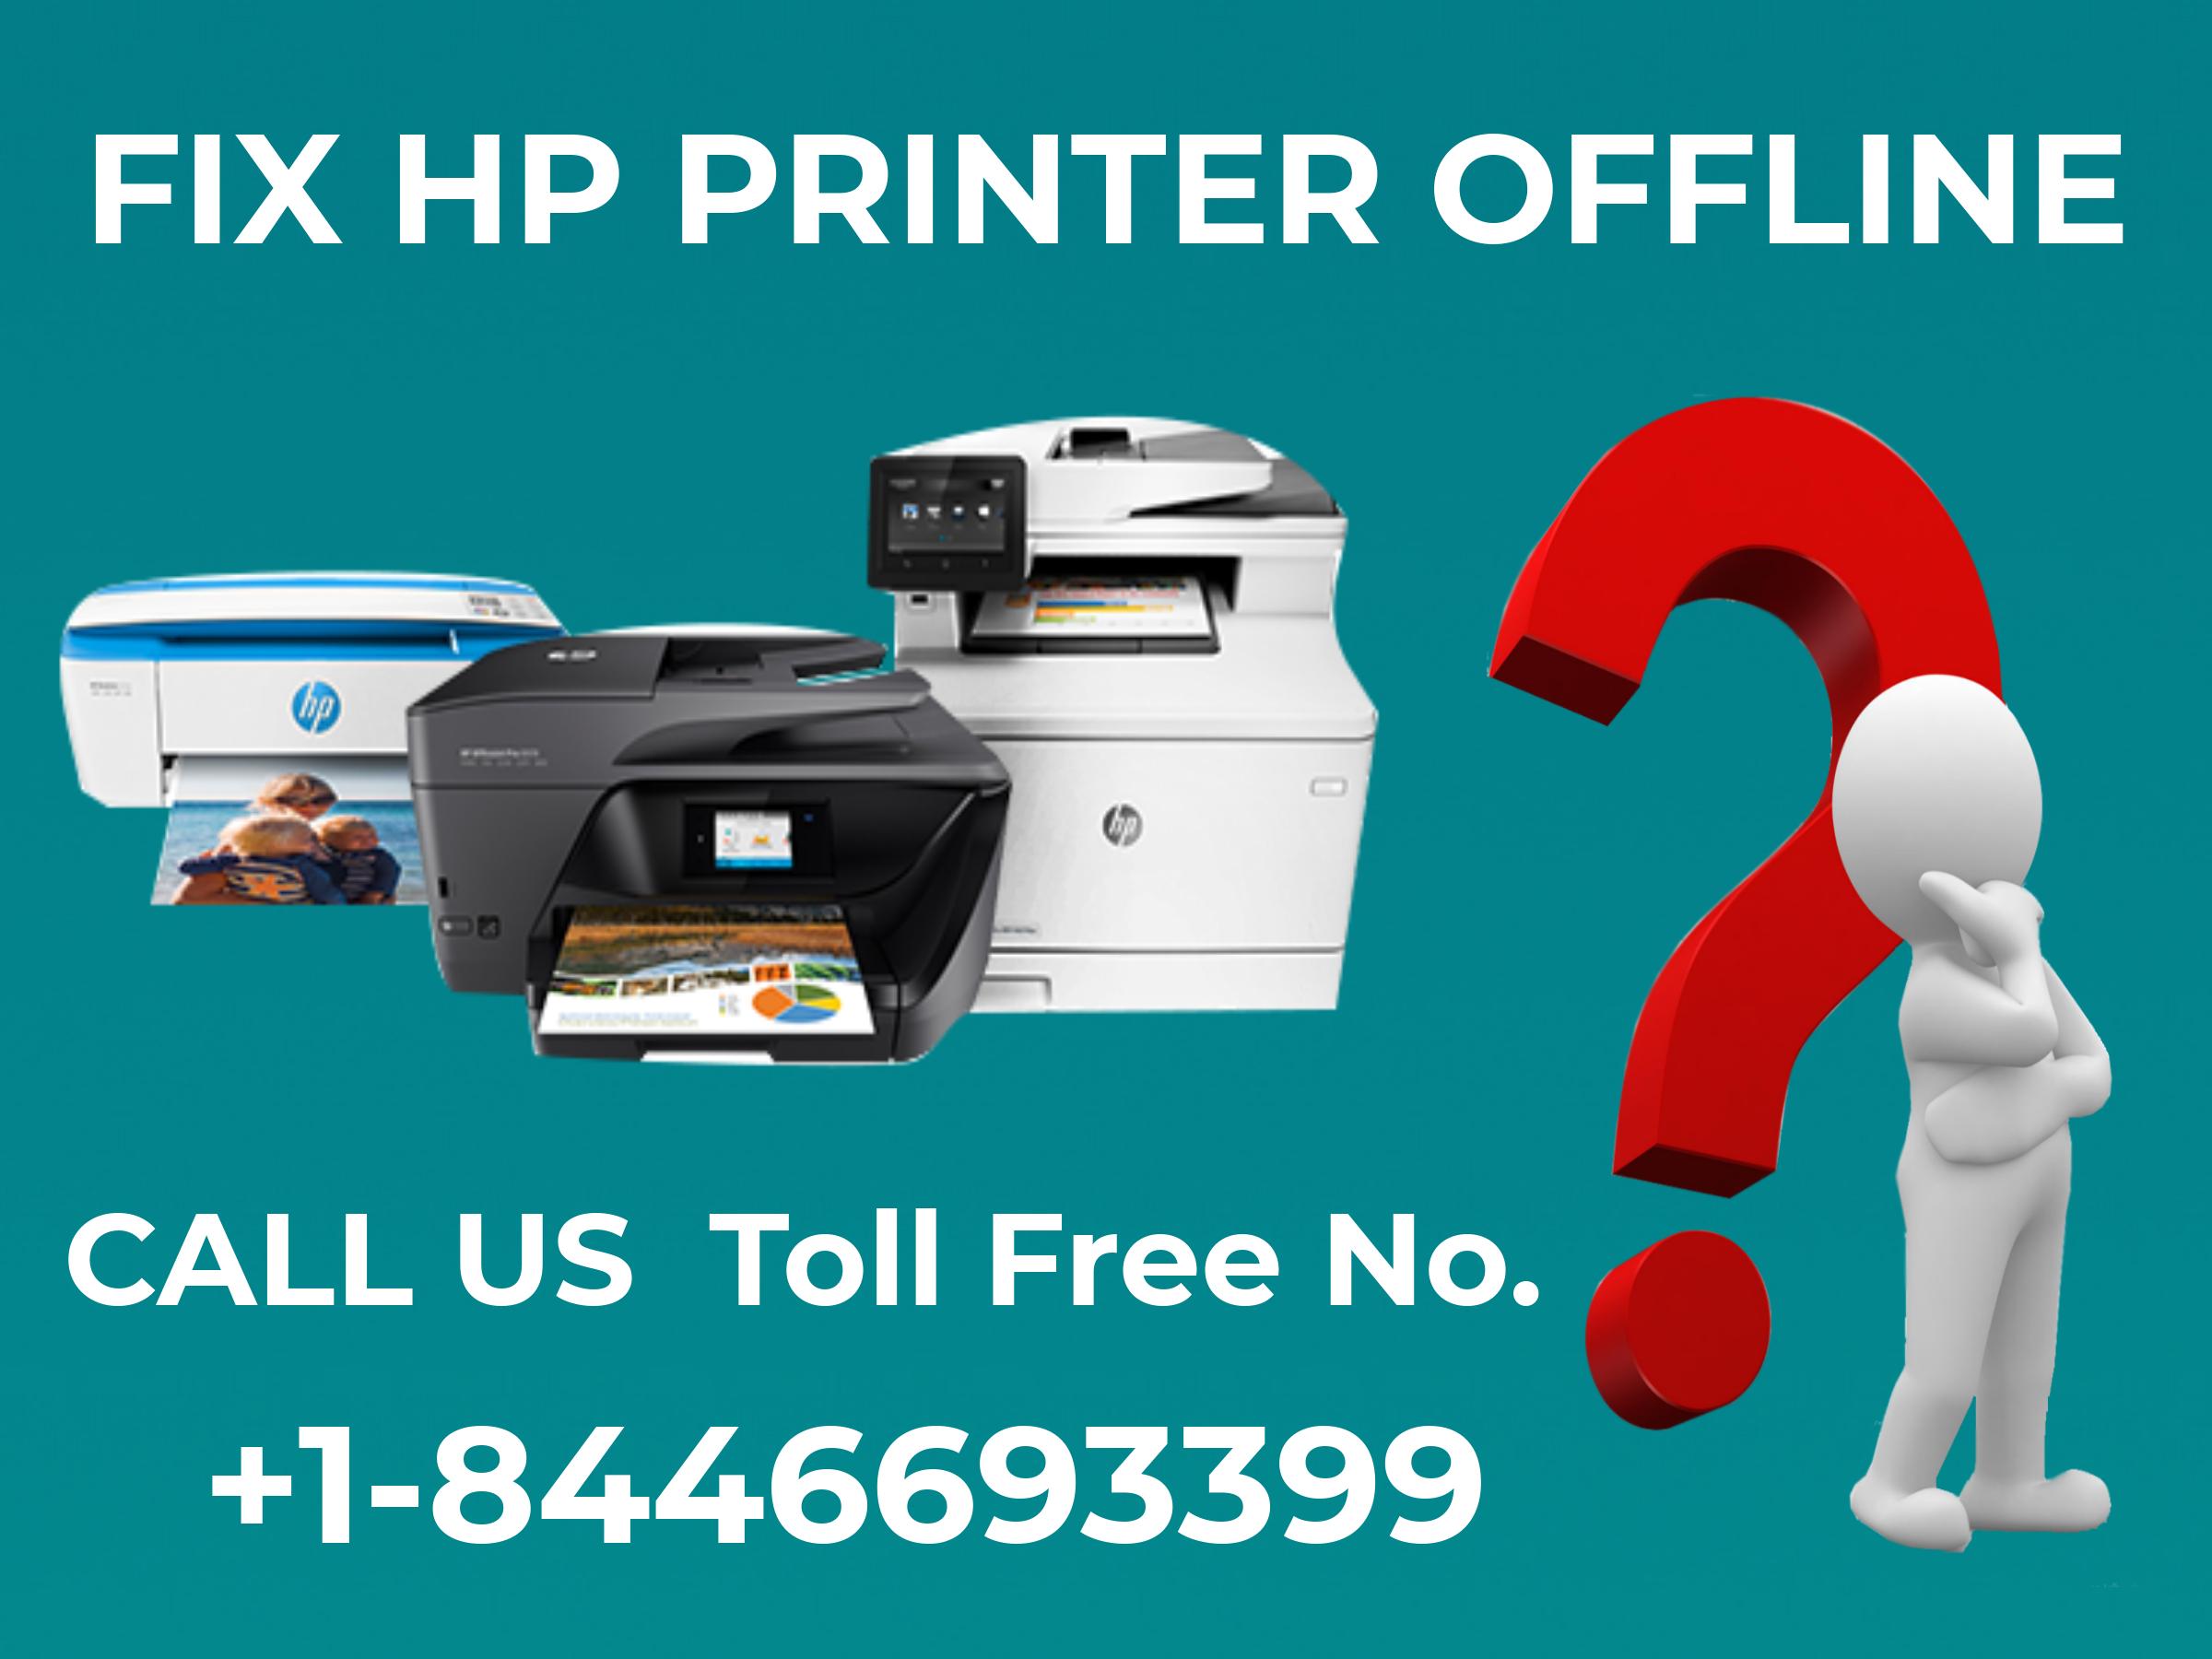 Hp Deskjet 3600 Printer Offline Hp Printer Printer Offline